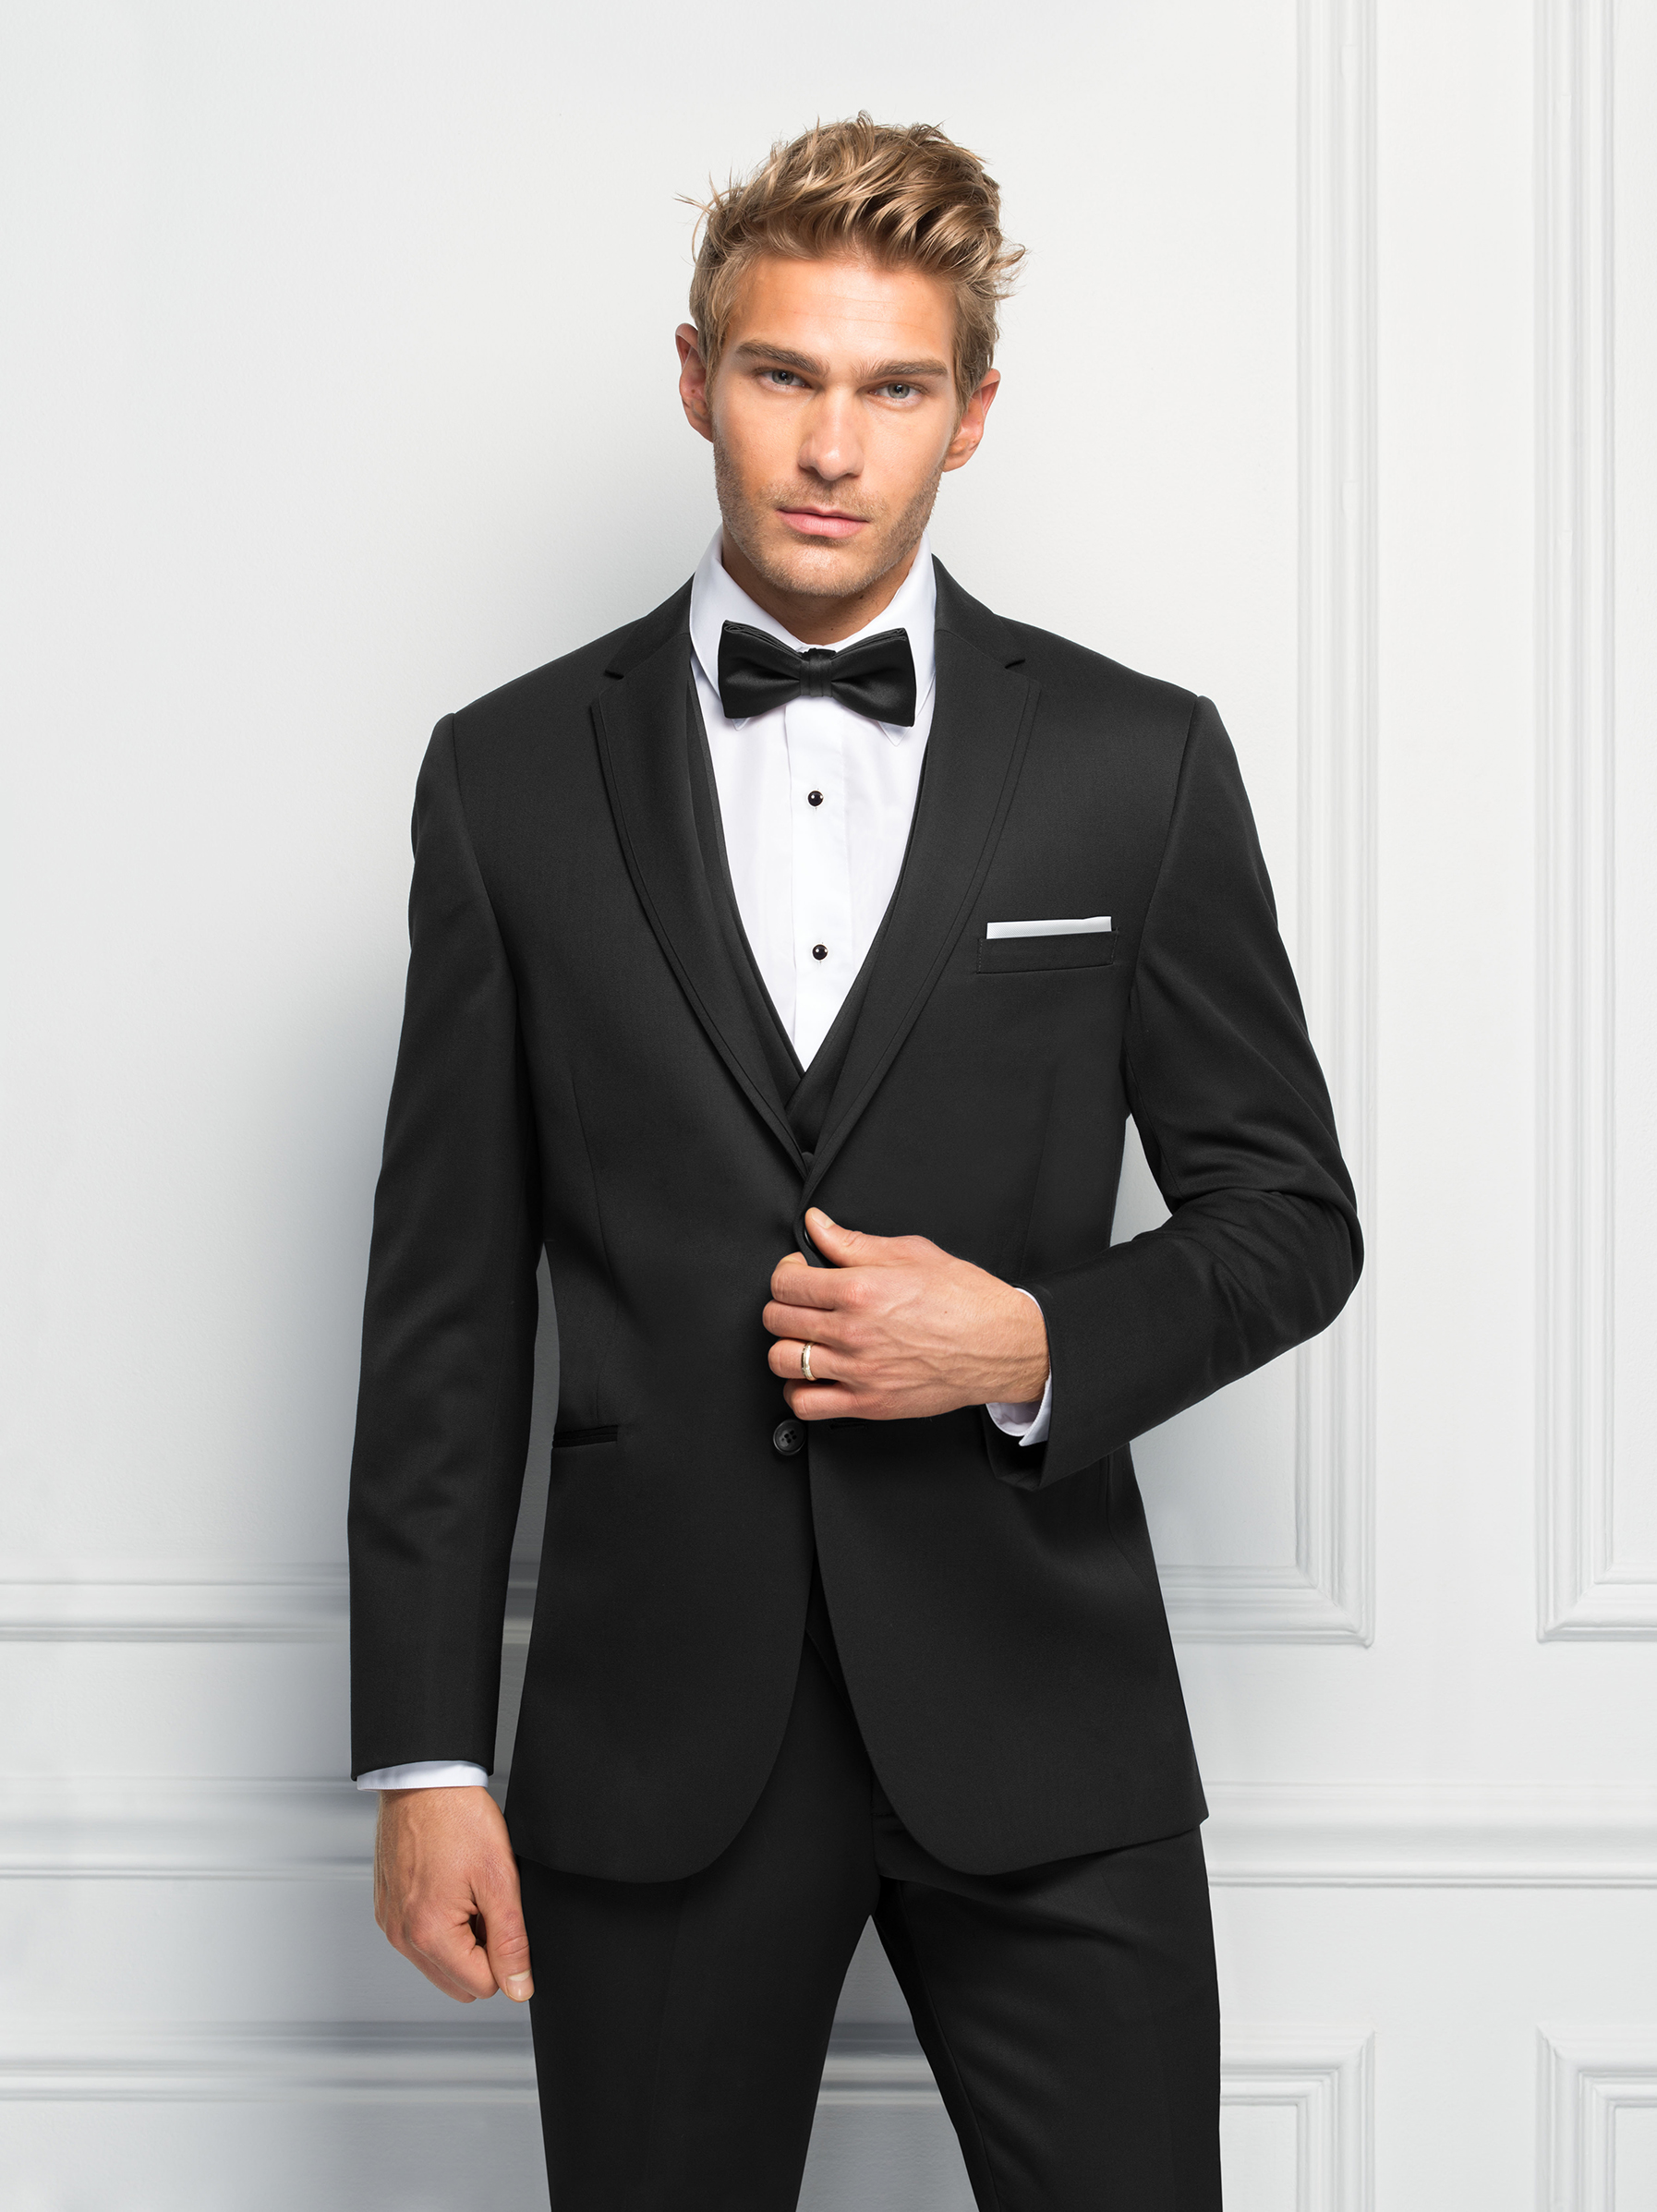 Tuxedo Rentals - Libin\'s Clothing